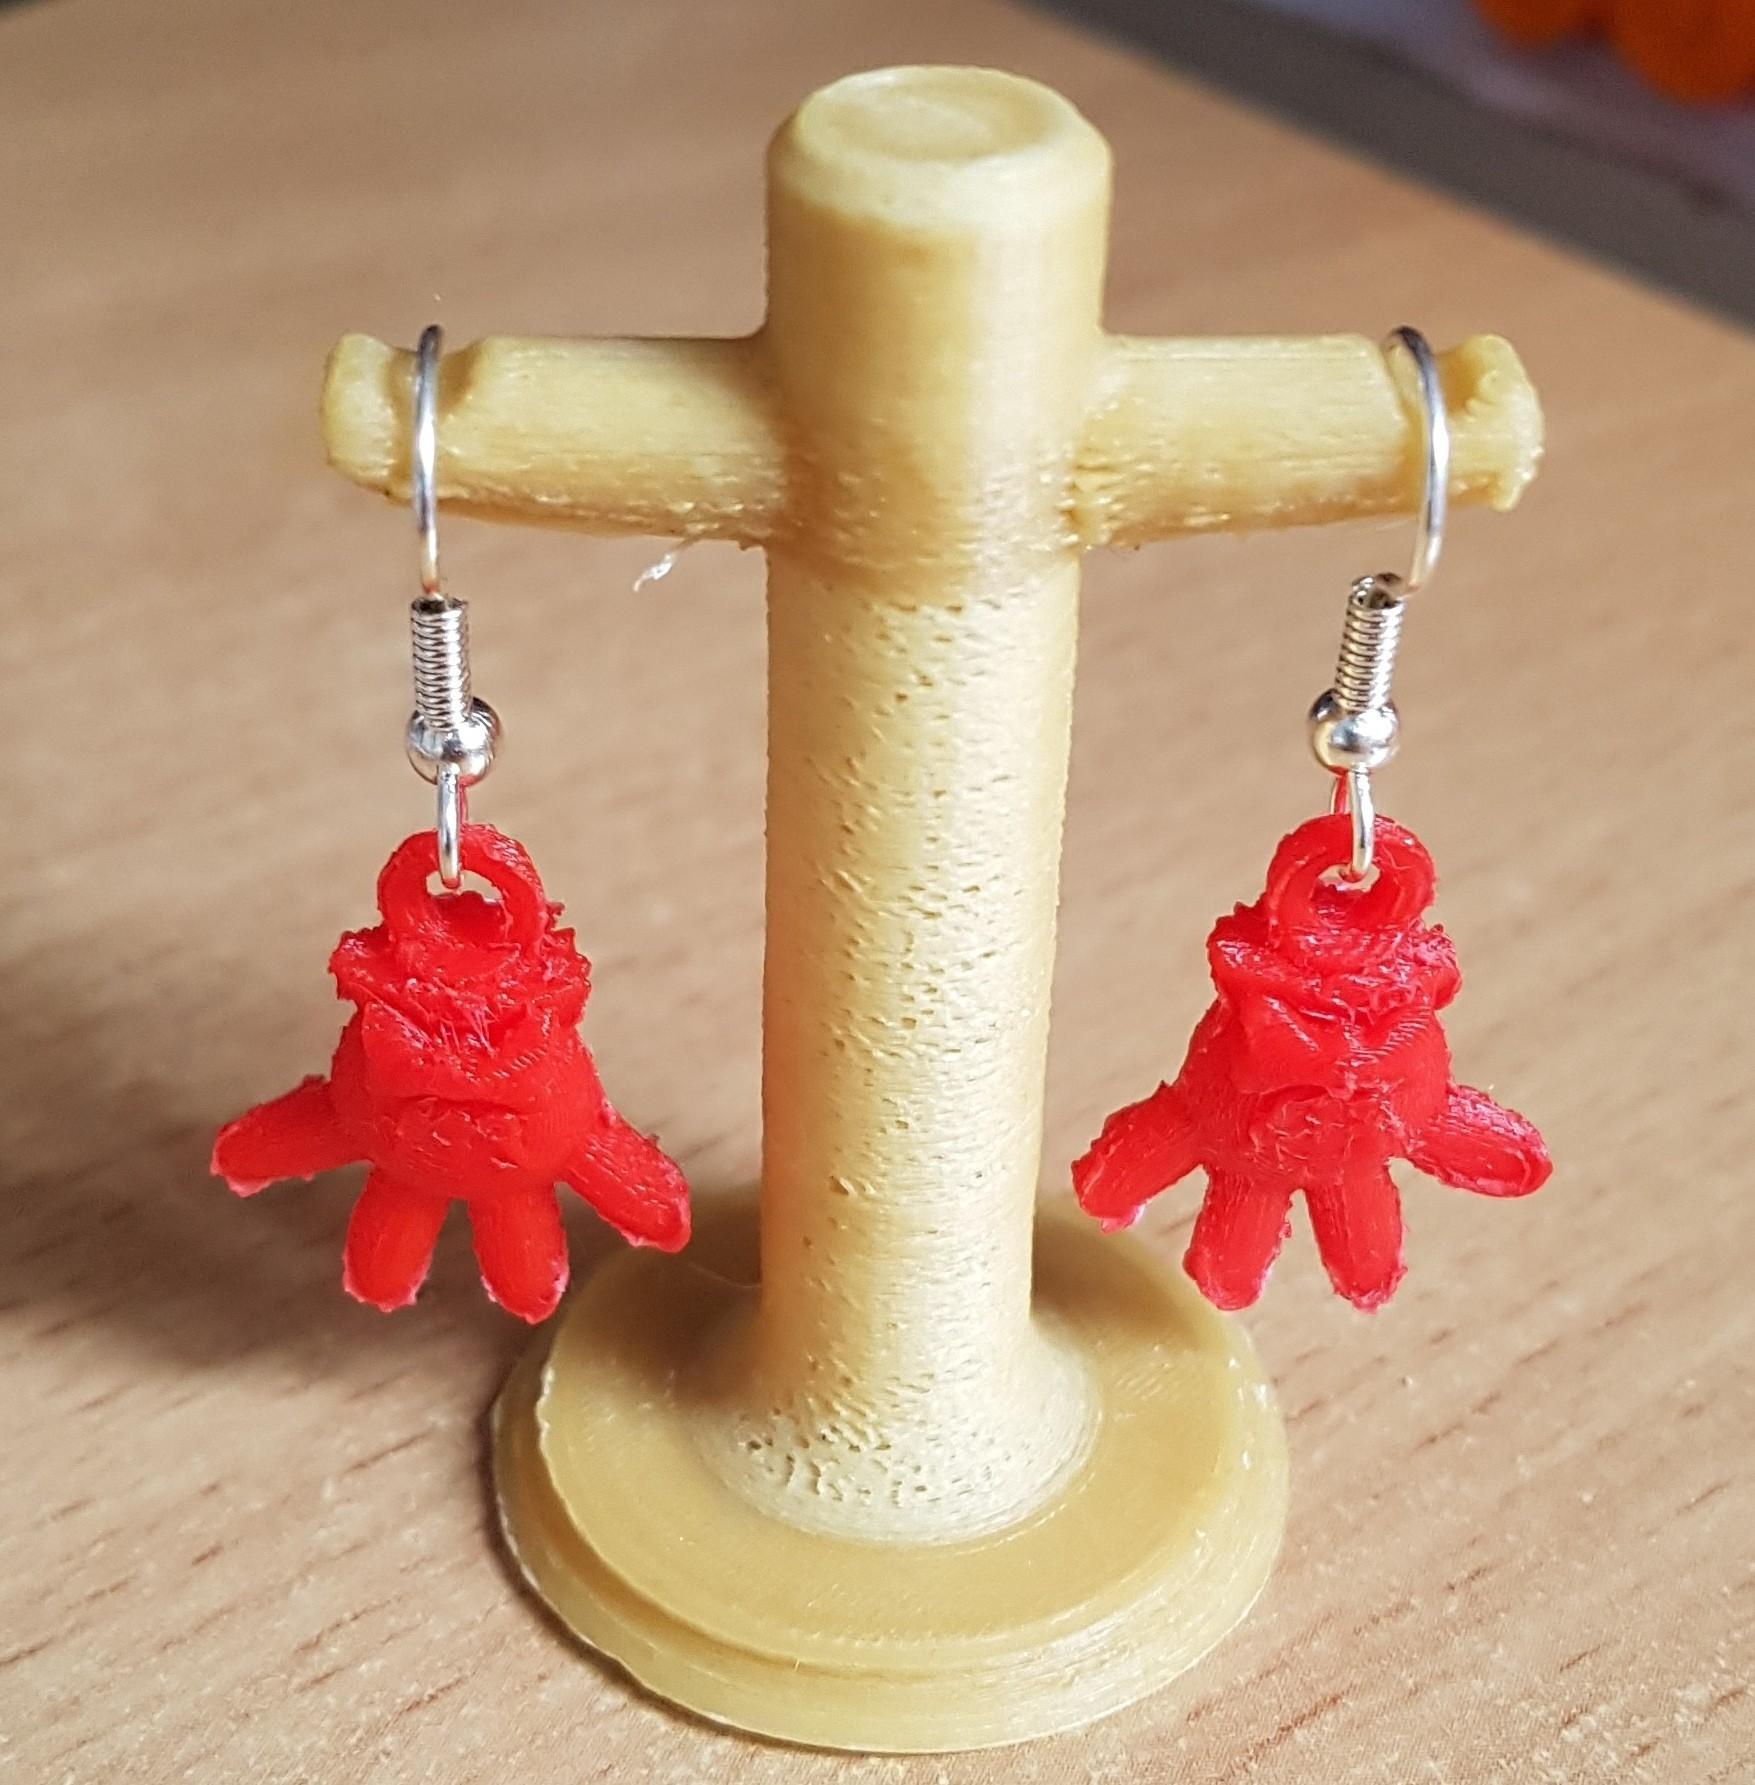 20180923_175029.jpg Download STL file Earrings Pendant - Minnie Gloves • 3D printer design, yalcars